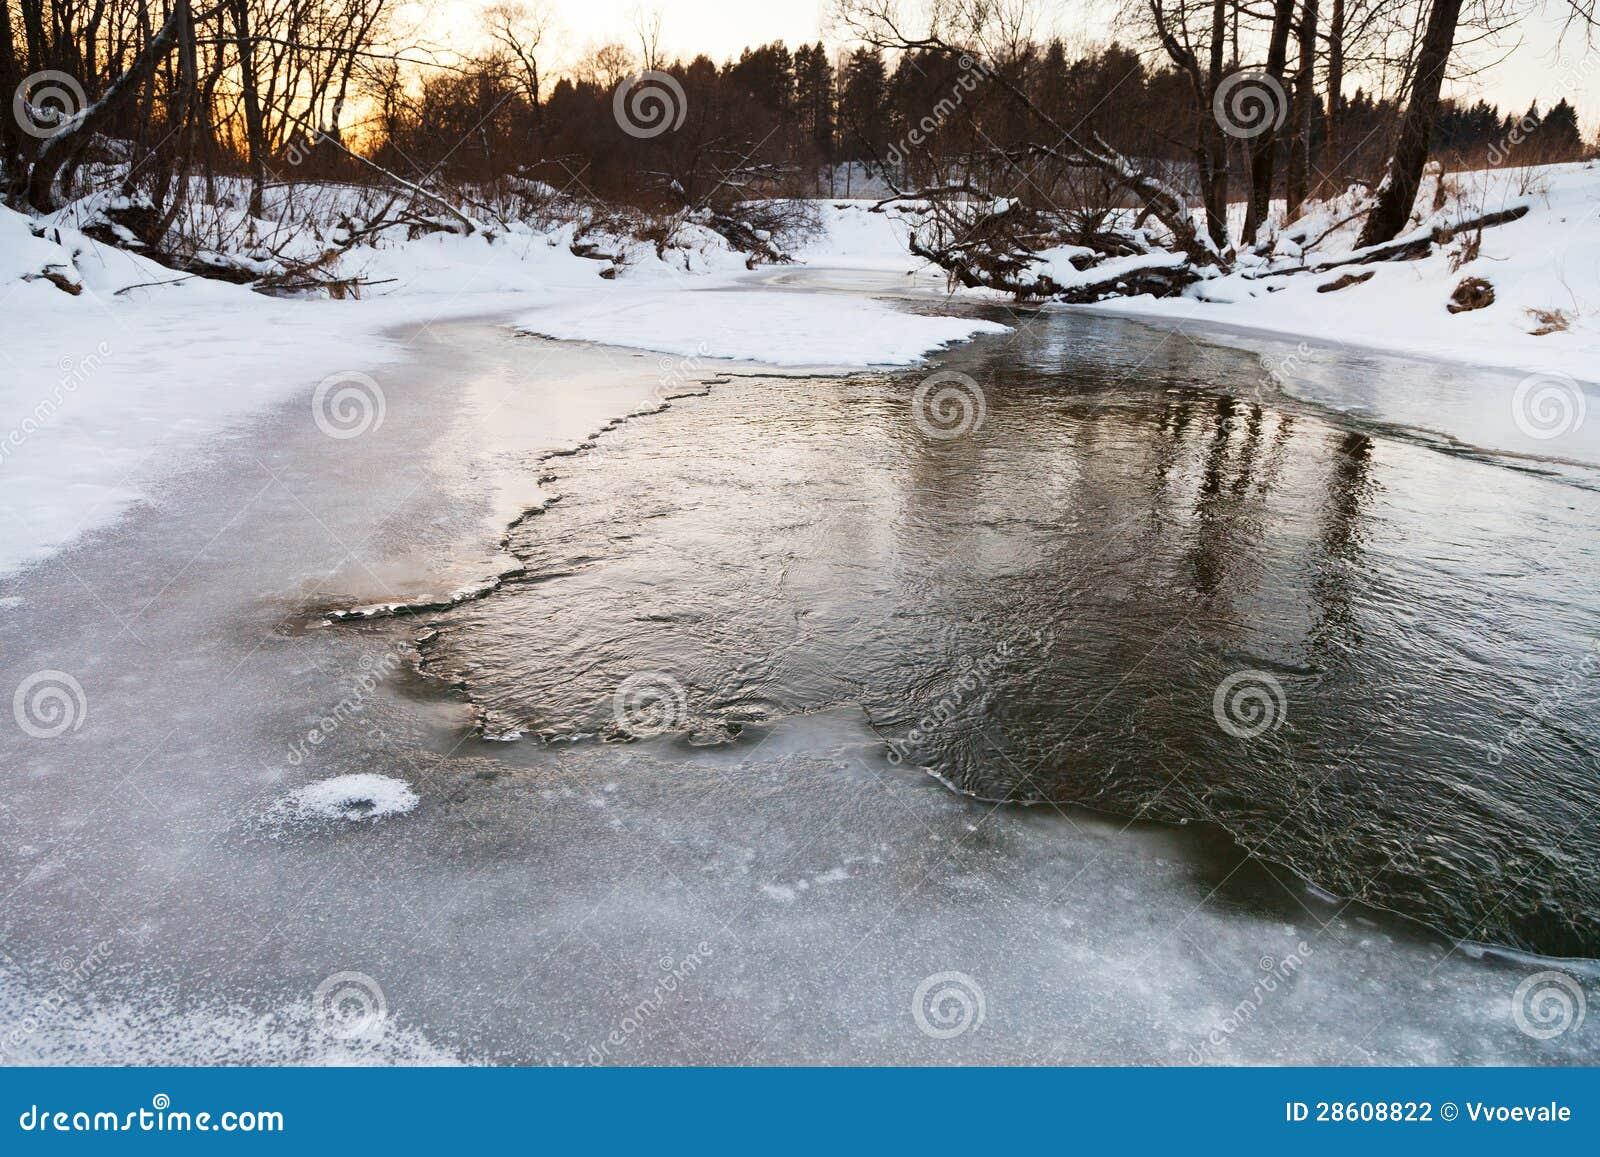 Den djupfryst flodstranden av skogen strömmer